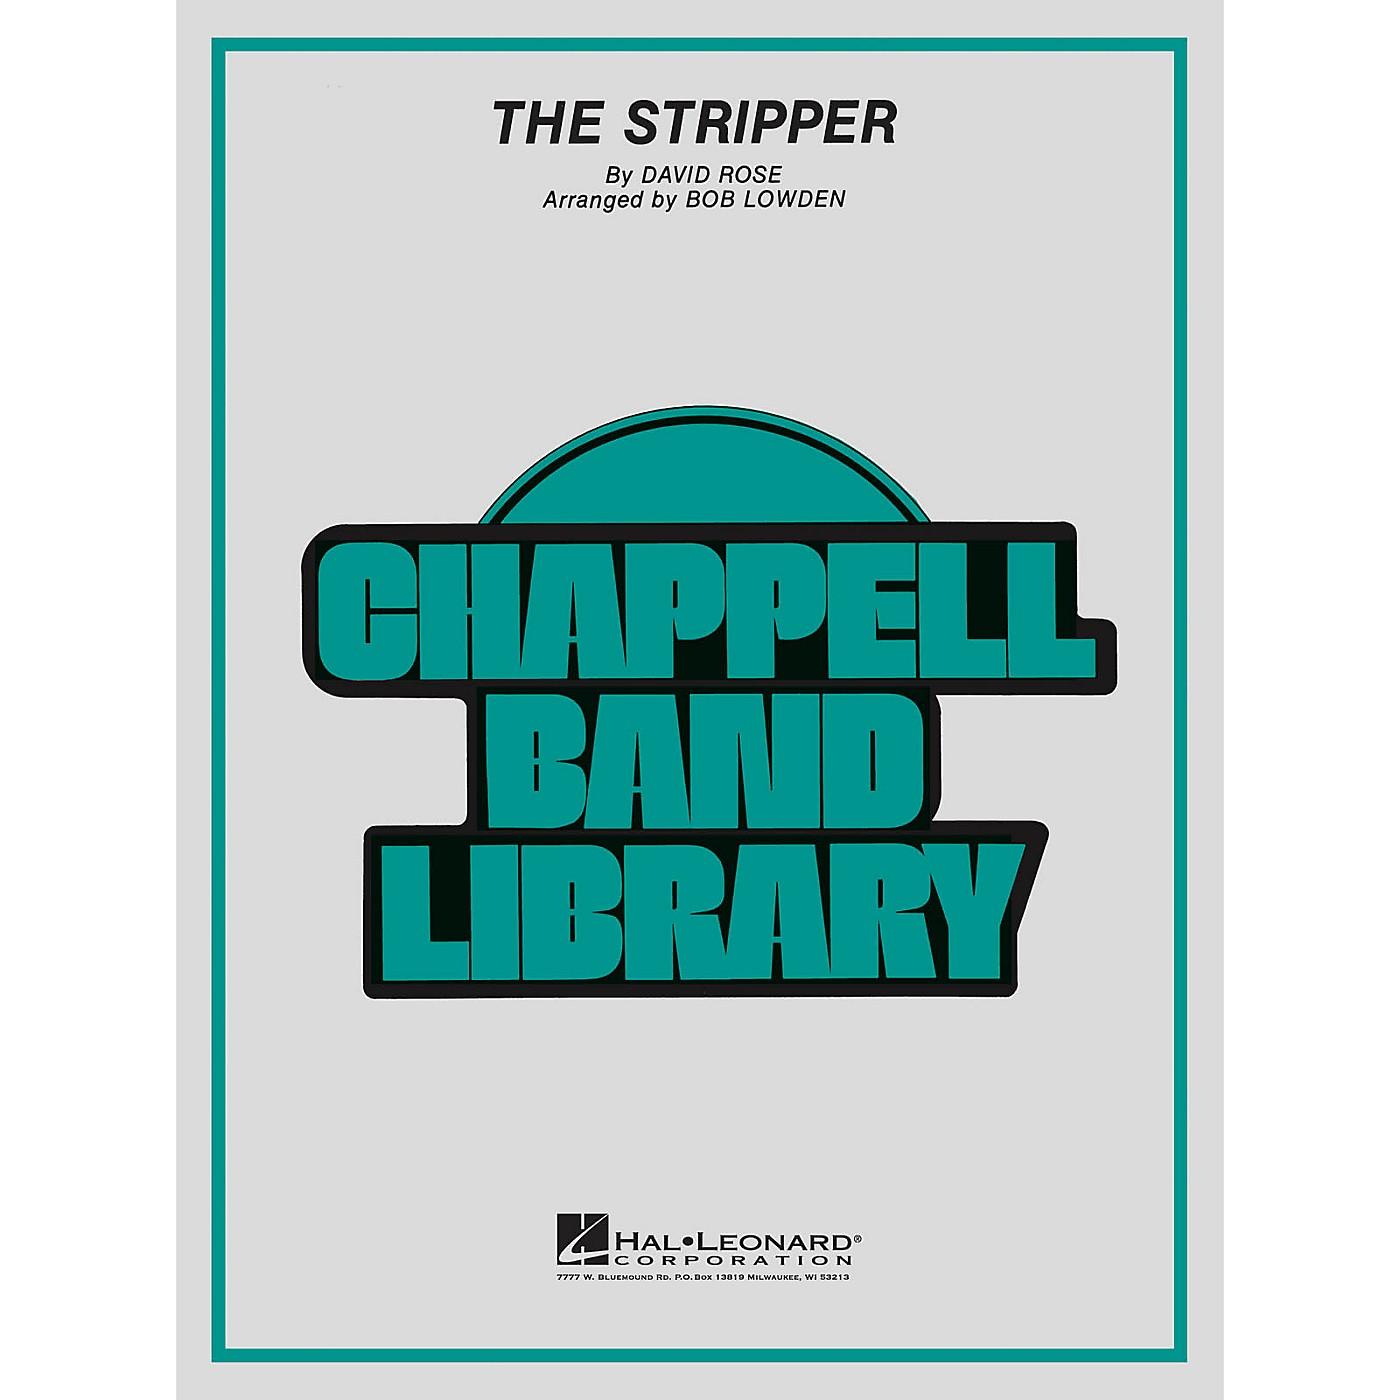 Hal Leonard The Stripper Concert Band Level 4 Arranged by Bob Lowden thumbnail